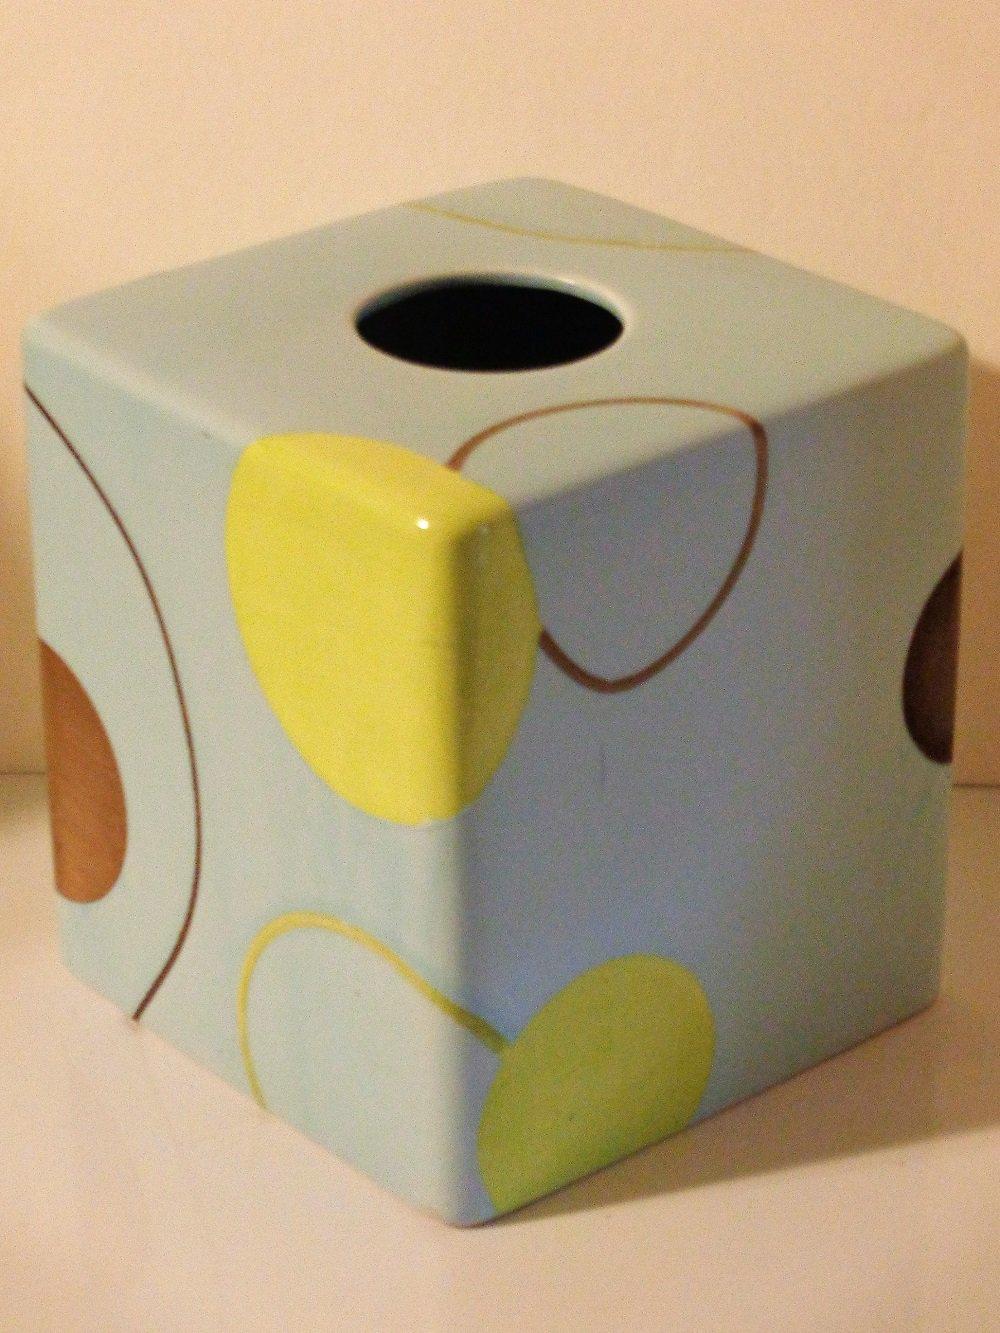 Modern Circles Game Ceramic Tissue Box Cover